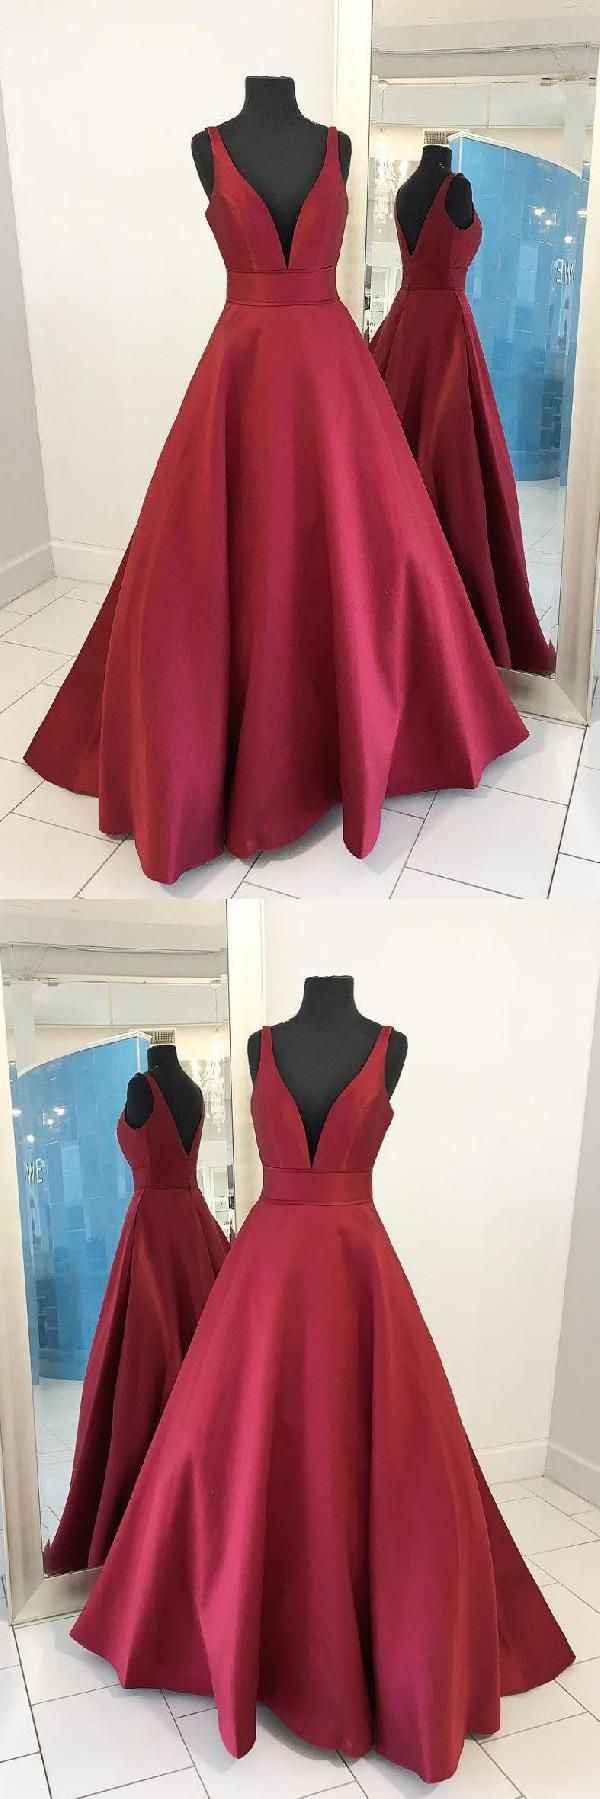 Long prom dresses prom dresses red simple prom dresses dress